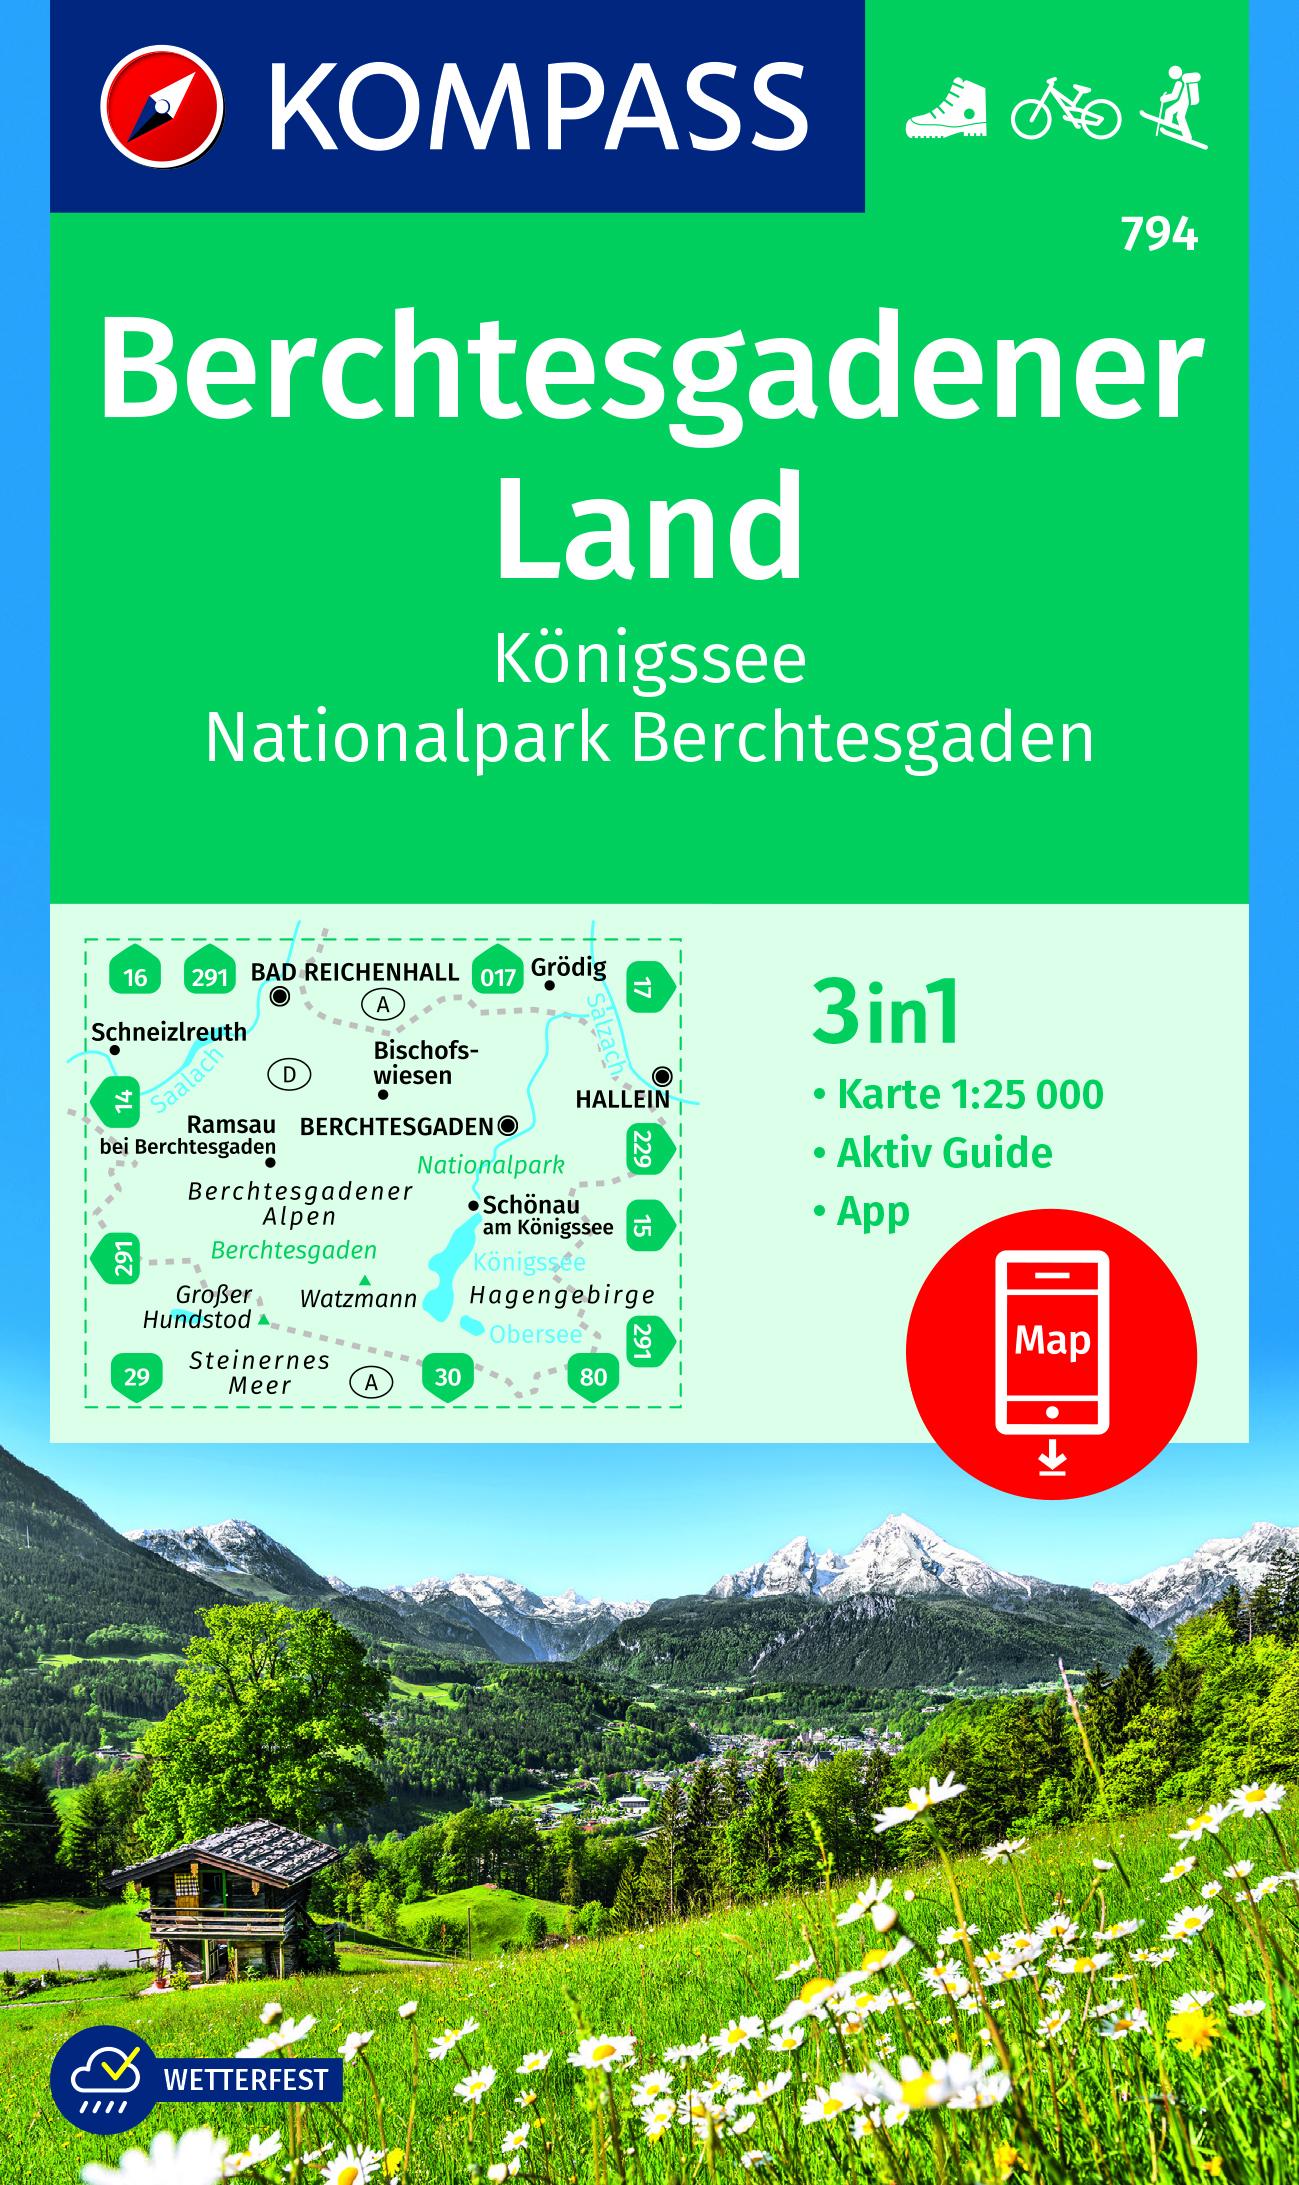 Berchtesgadener Land Karte.Kompass Karte 794 Berchtesgadener Land 1 25 000 Wandern